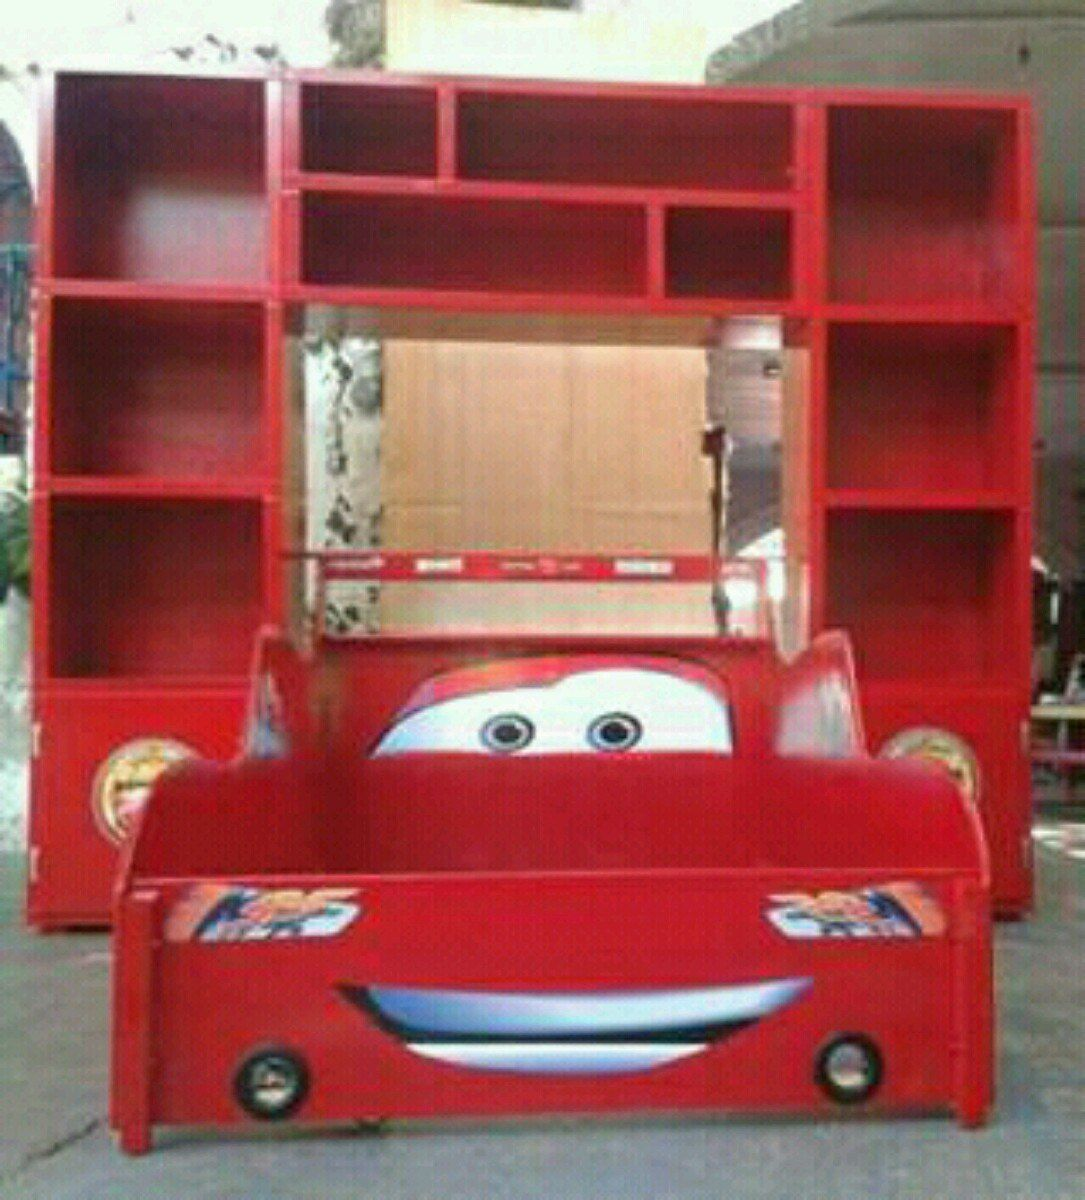 Cama Rayo Mcqueen Cama Carro Cars Recamara Infantil Librero  # Muebles Sion Bogota